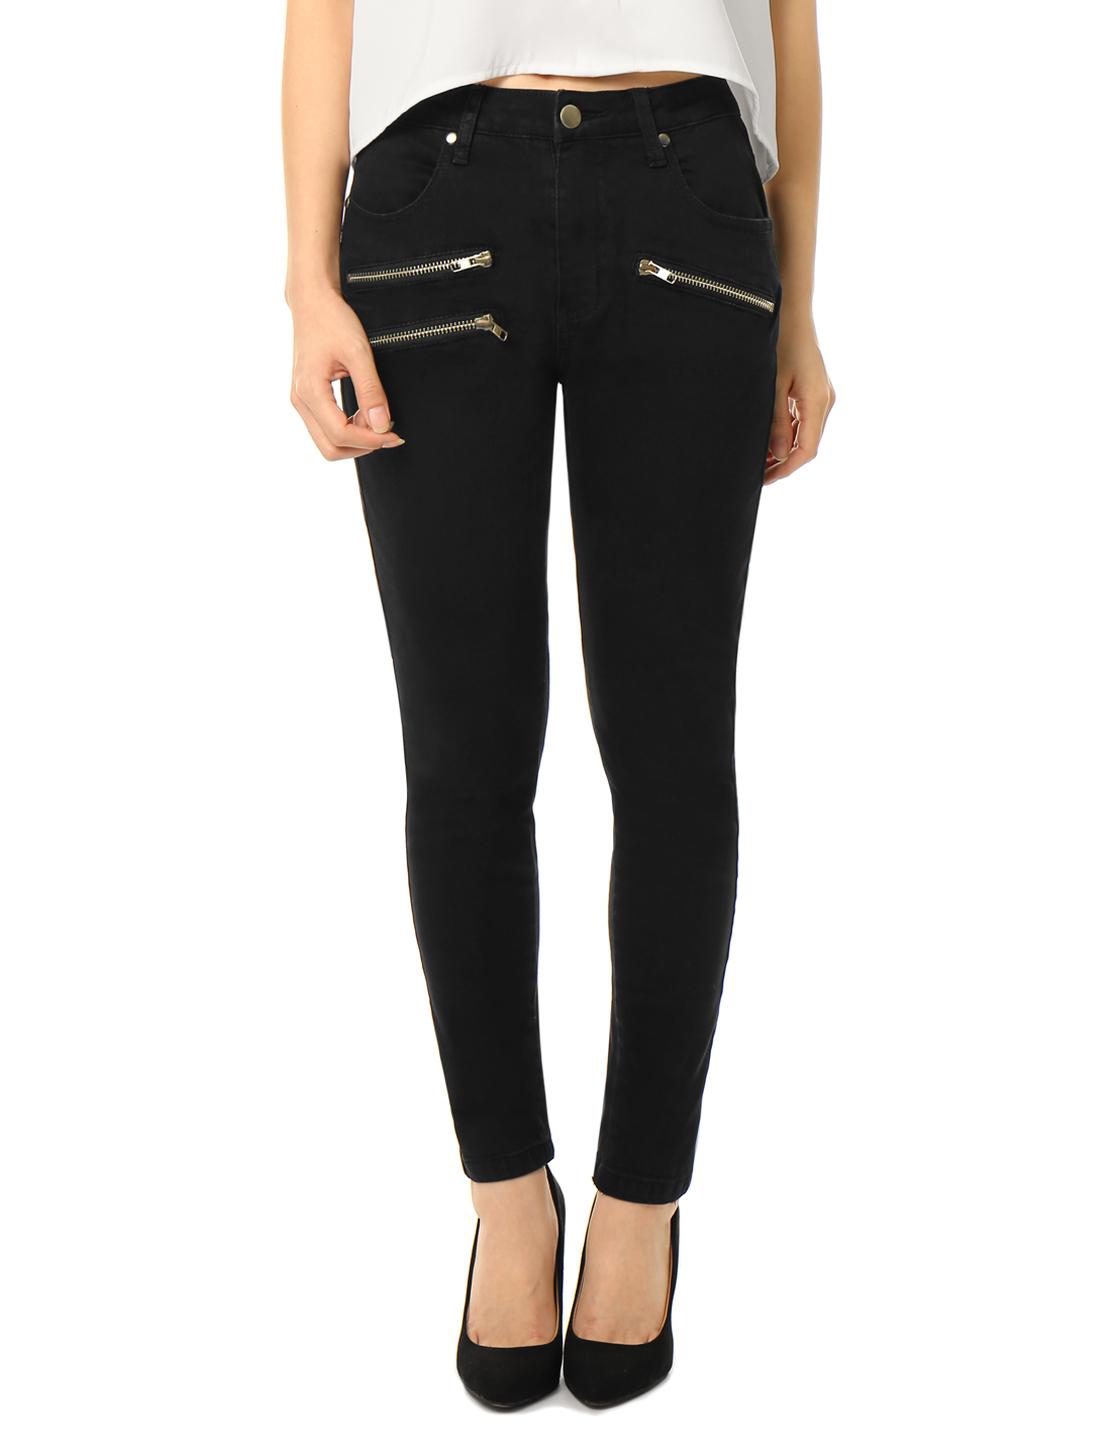 Women Mid Rise Zipper Decor Stretchy Skinny Jeans Black L